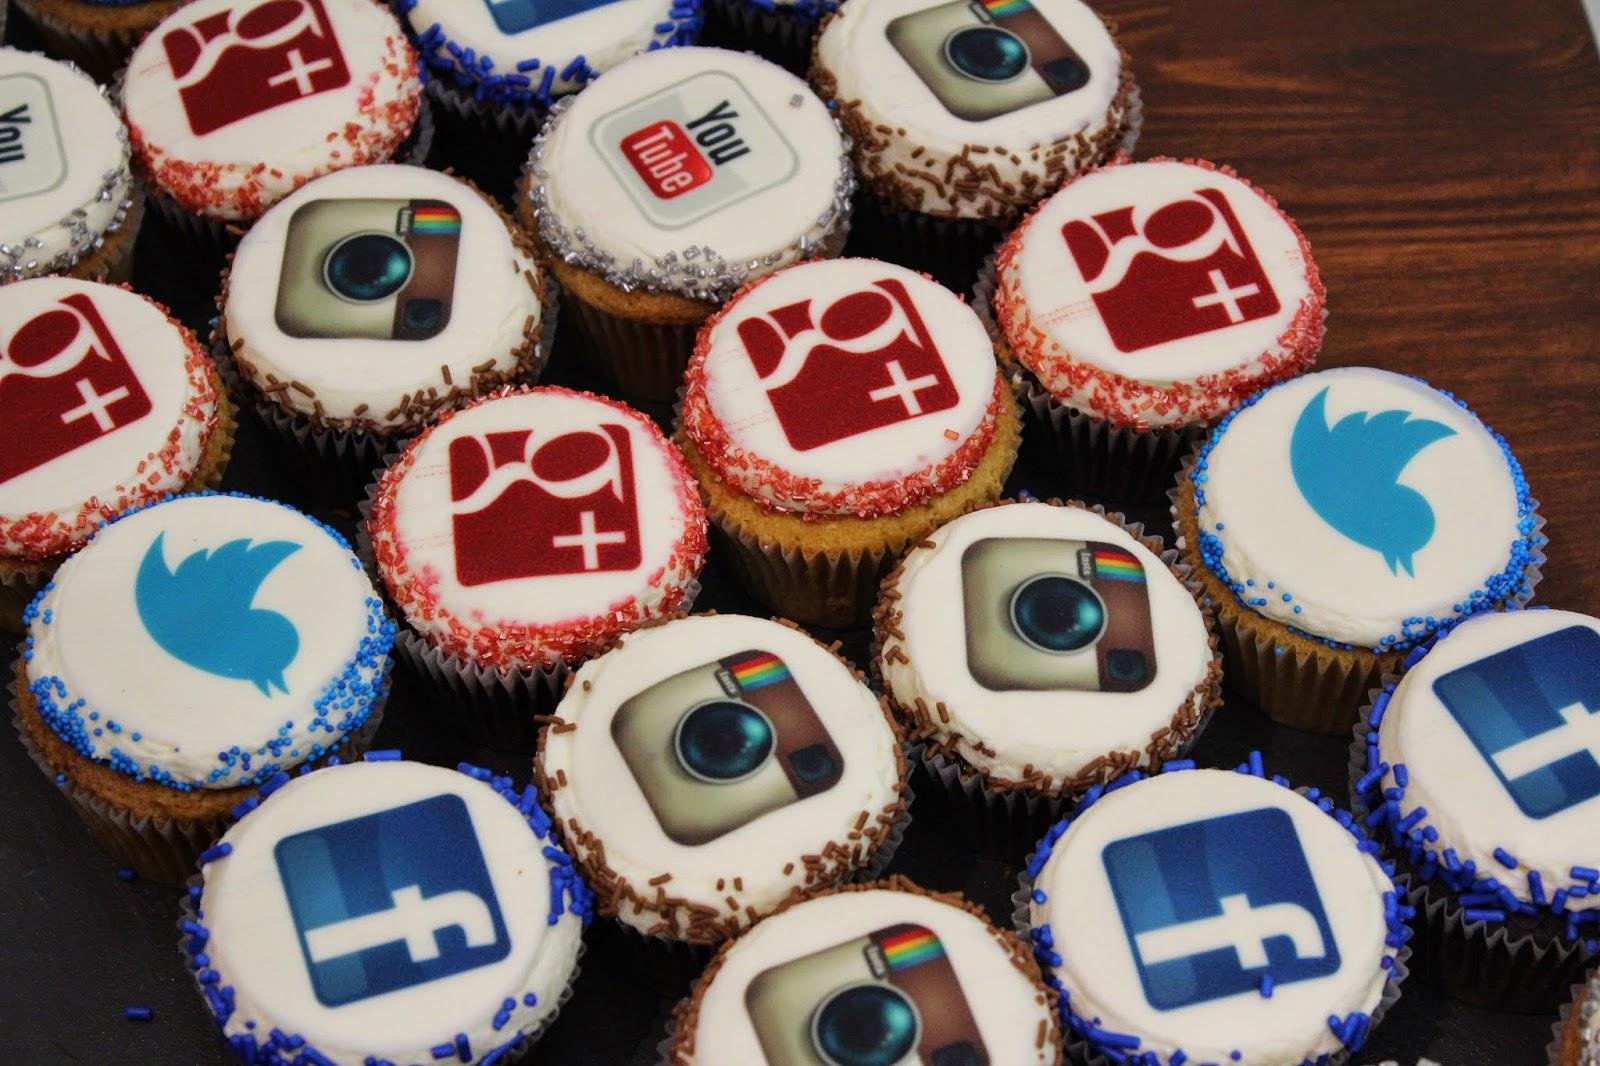 Access All Asos: Social Media School and Asos HQ